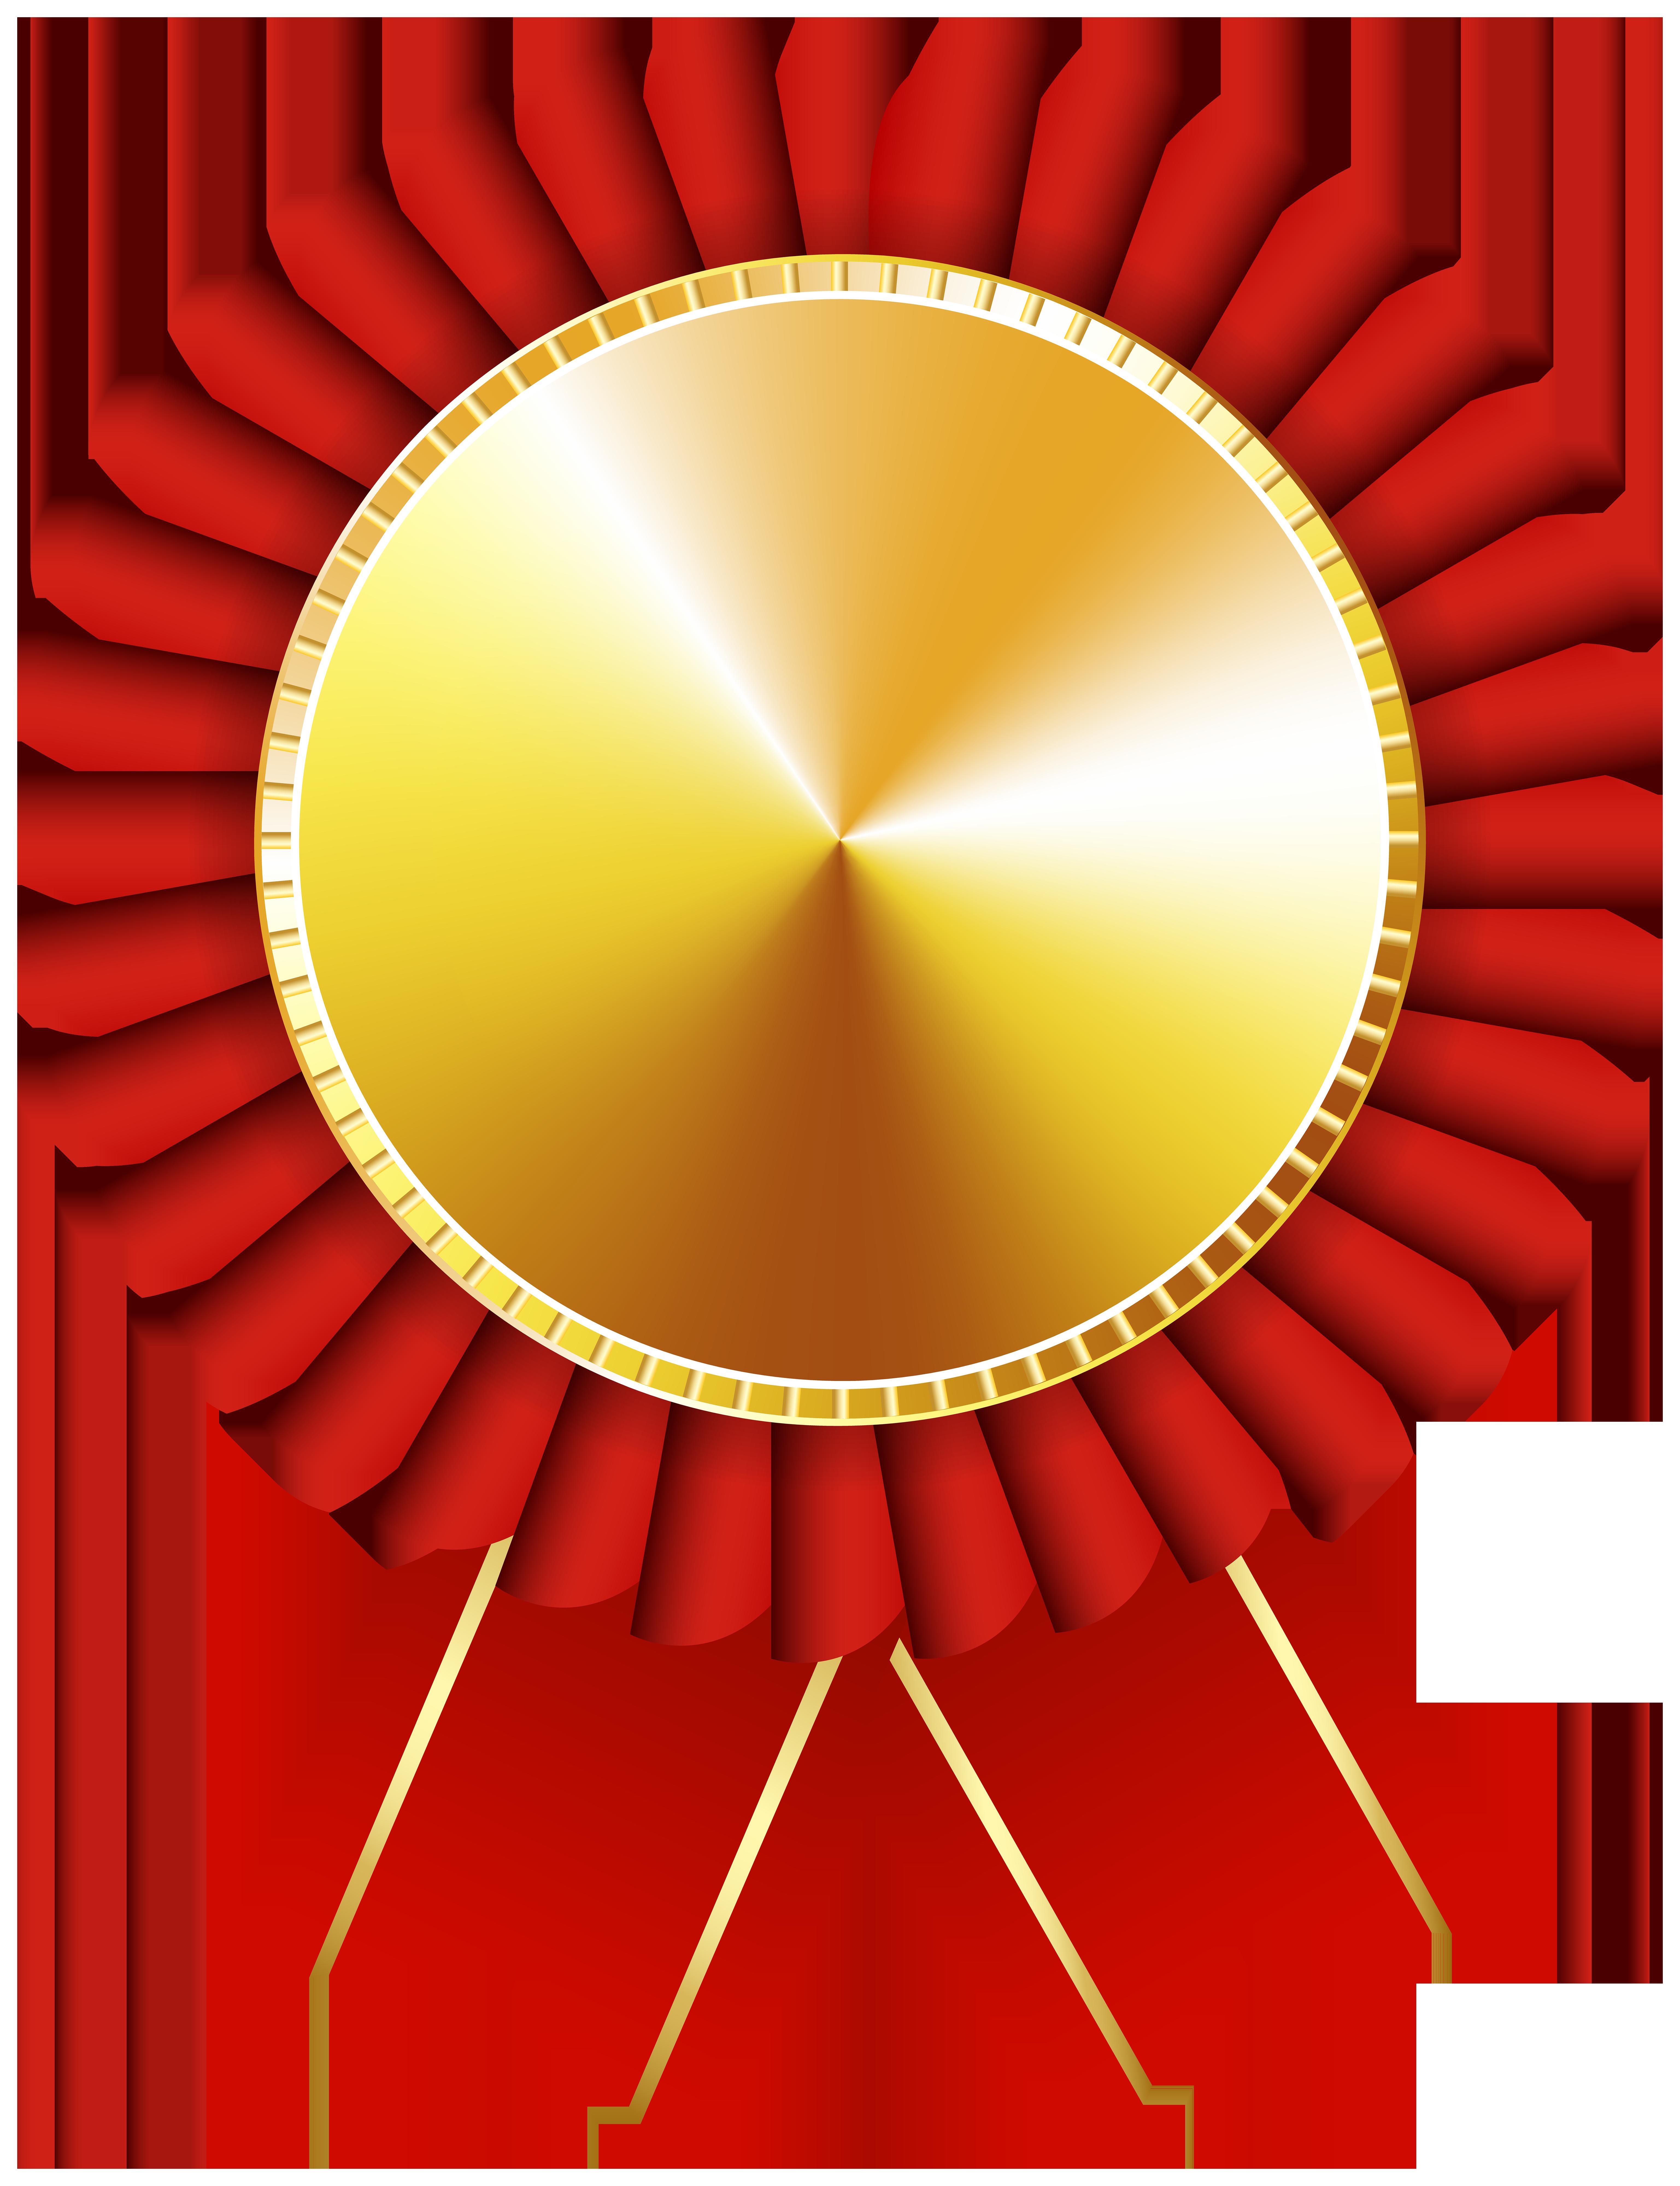 Rosette Ribbon Red Gold Transparent Image.